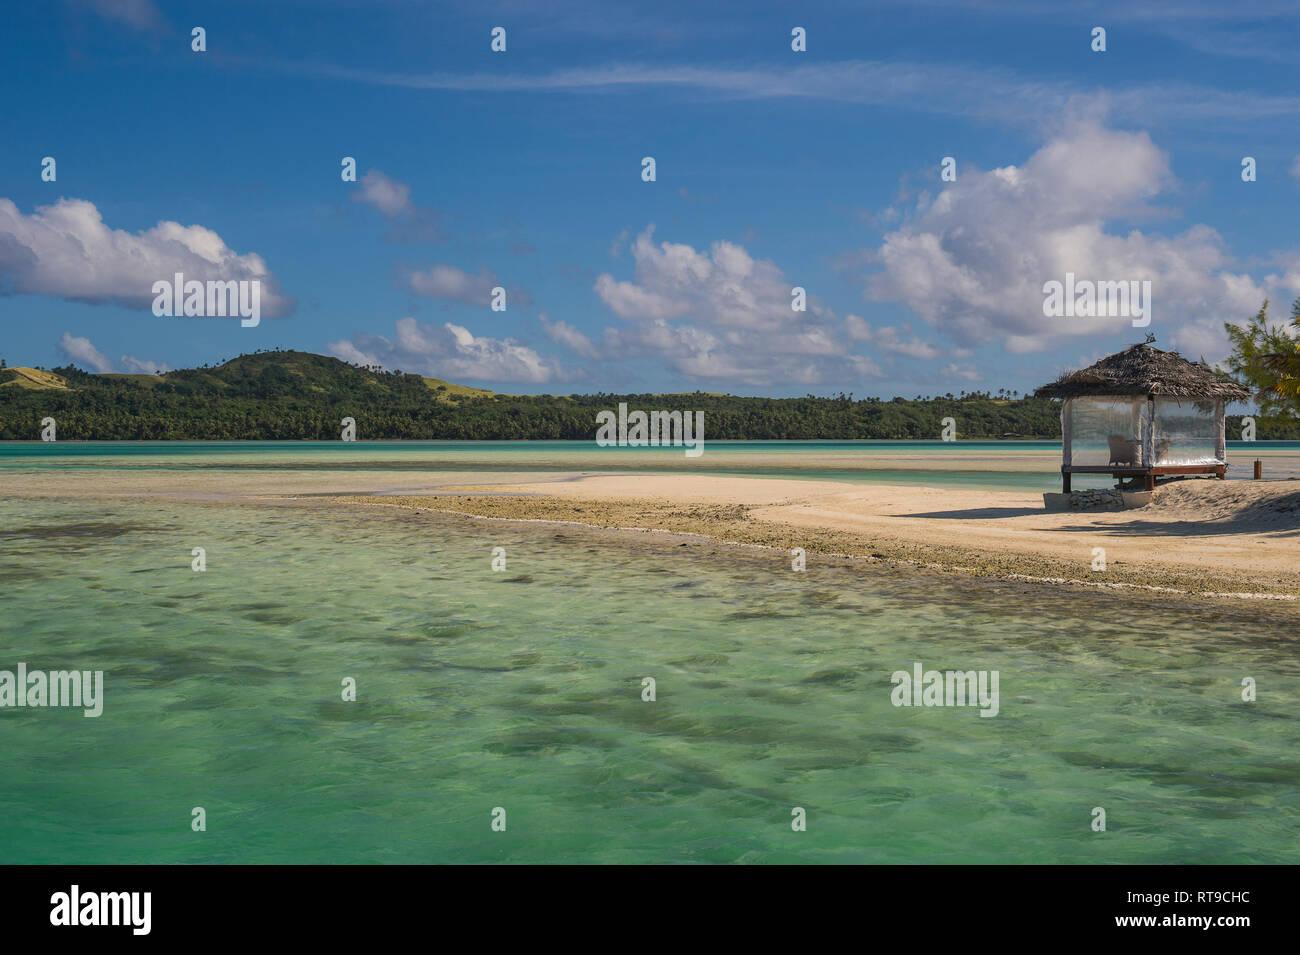 Cook Islands, Rarotonga, Aitutaki lagoon - Stock Image